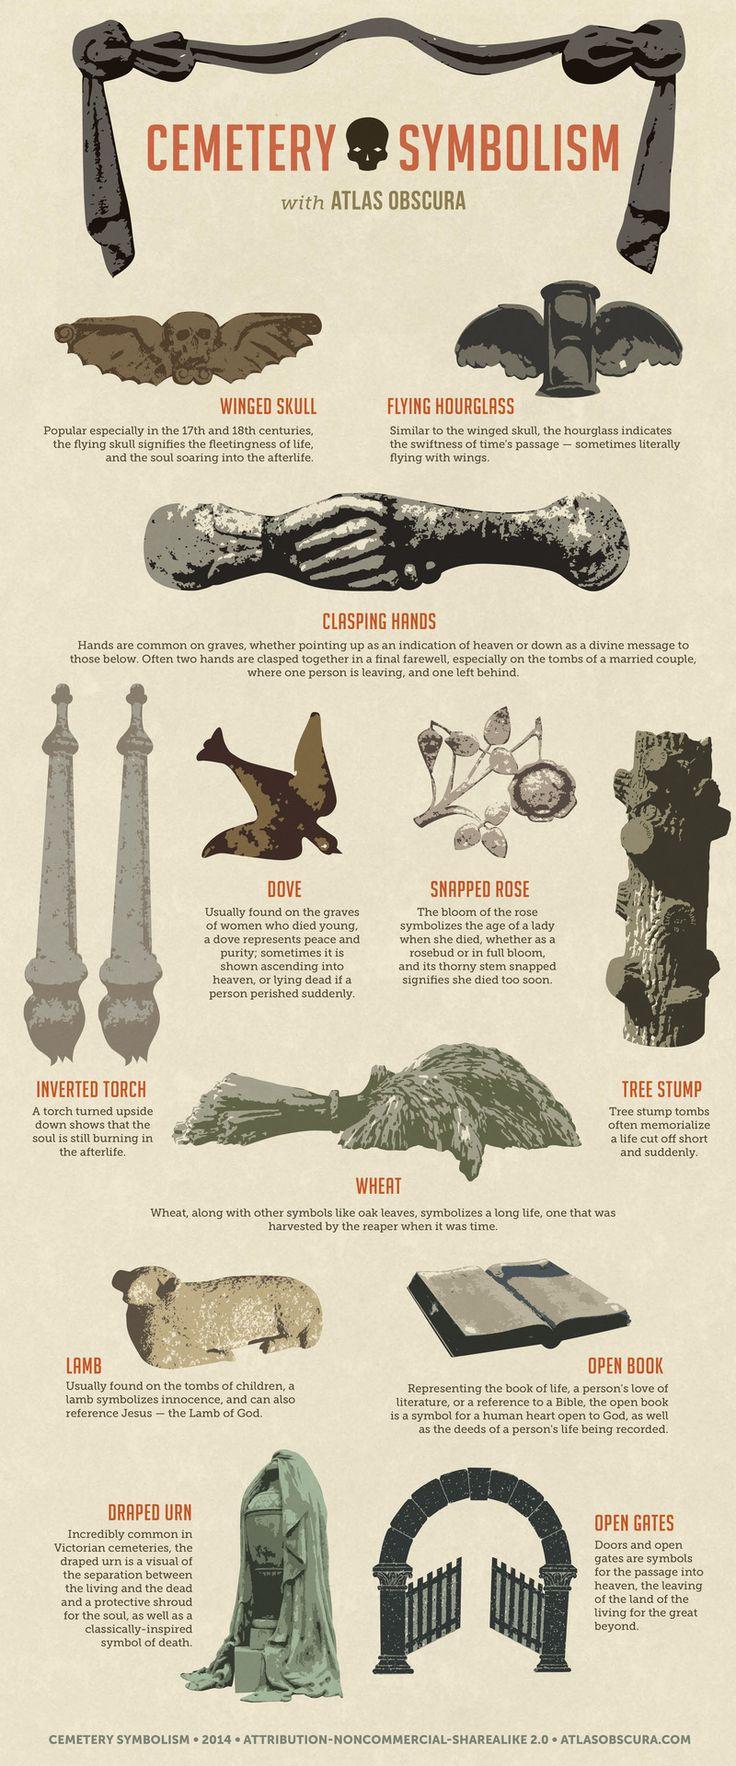 Halloween door decorations mummy downloader - Understand Cemetery Symoblism With This Infographic Halloween Treat